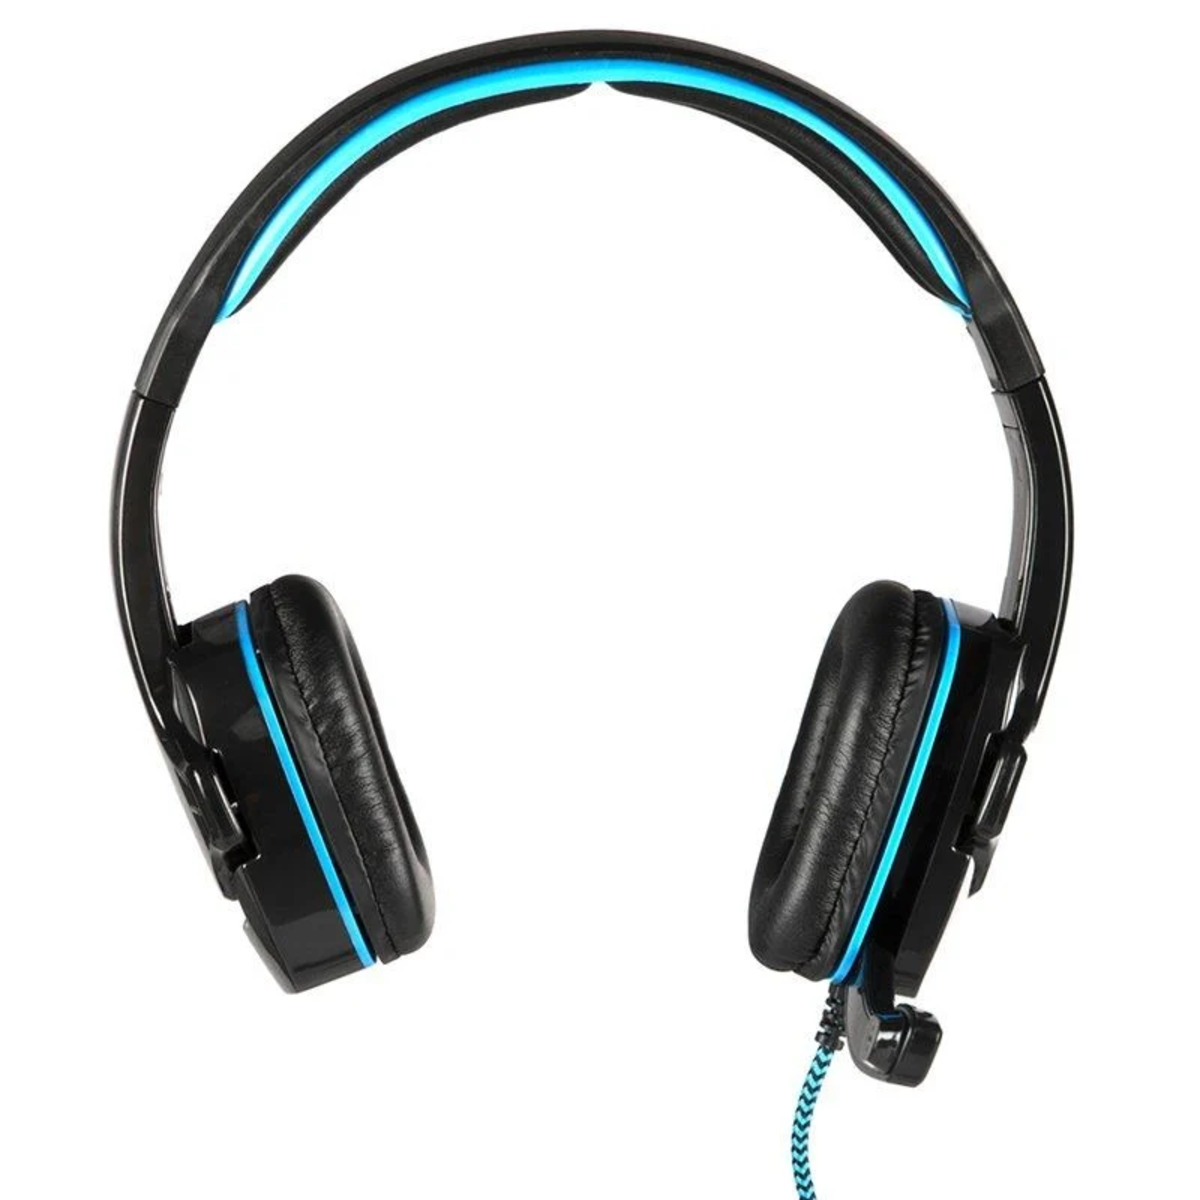 Auriculares Gaming NGS GHX-505. Micrófono negro azul GHX-505.